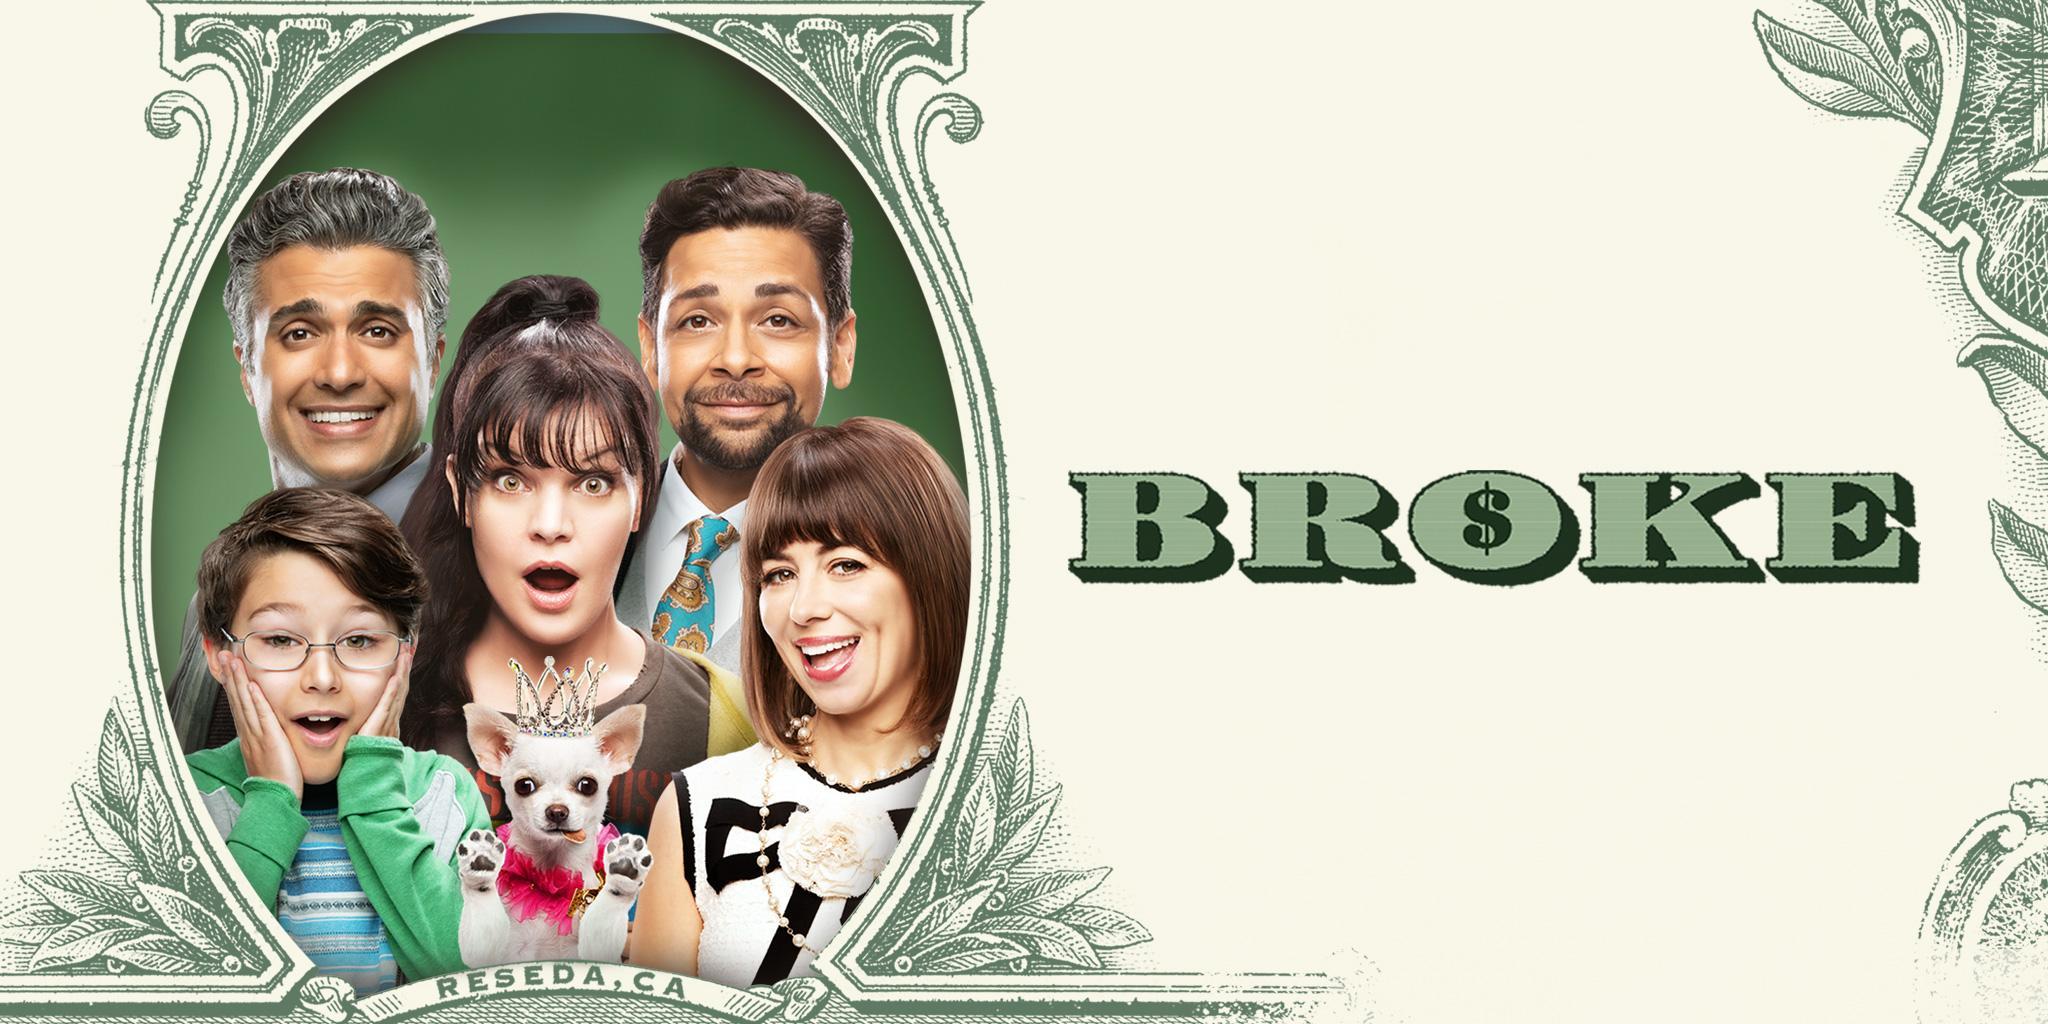 Broke: Season One Ratings - cancelado + programas de TV renovados 2